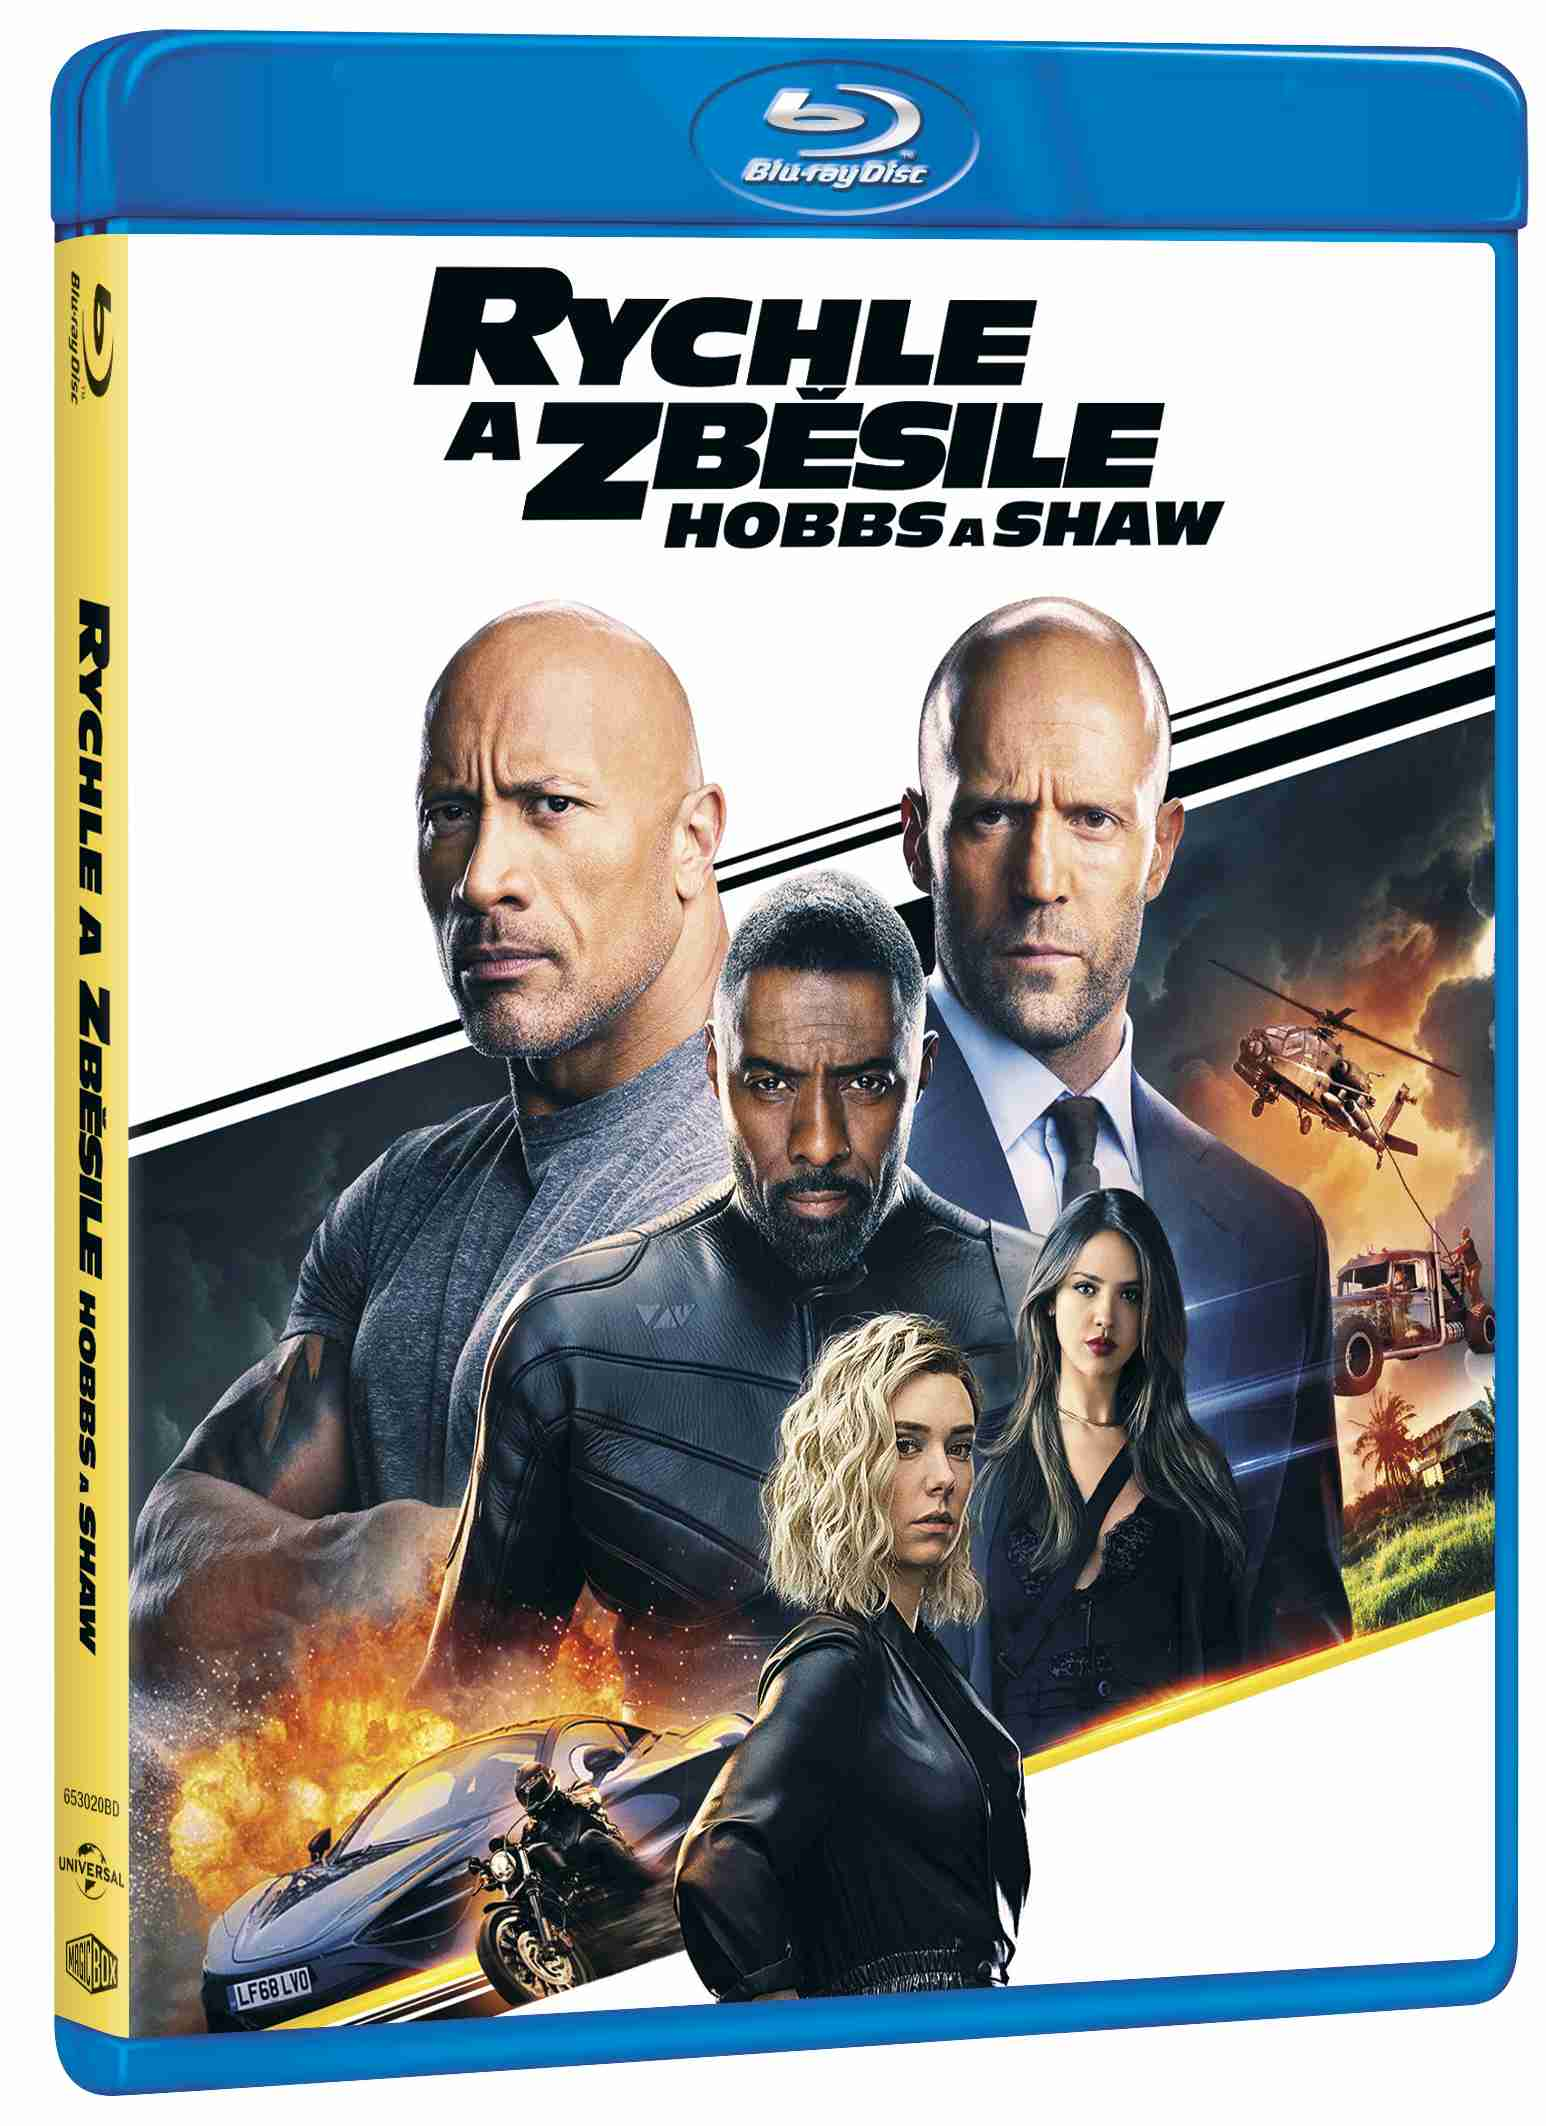 Rychle a zběsile: Hobbs a Shaw - Blu-ray